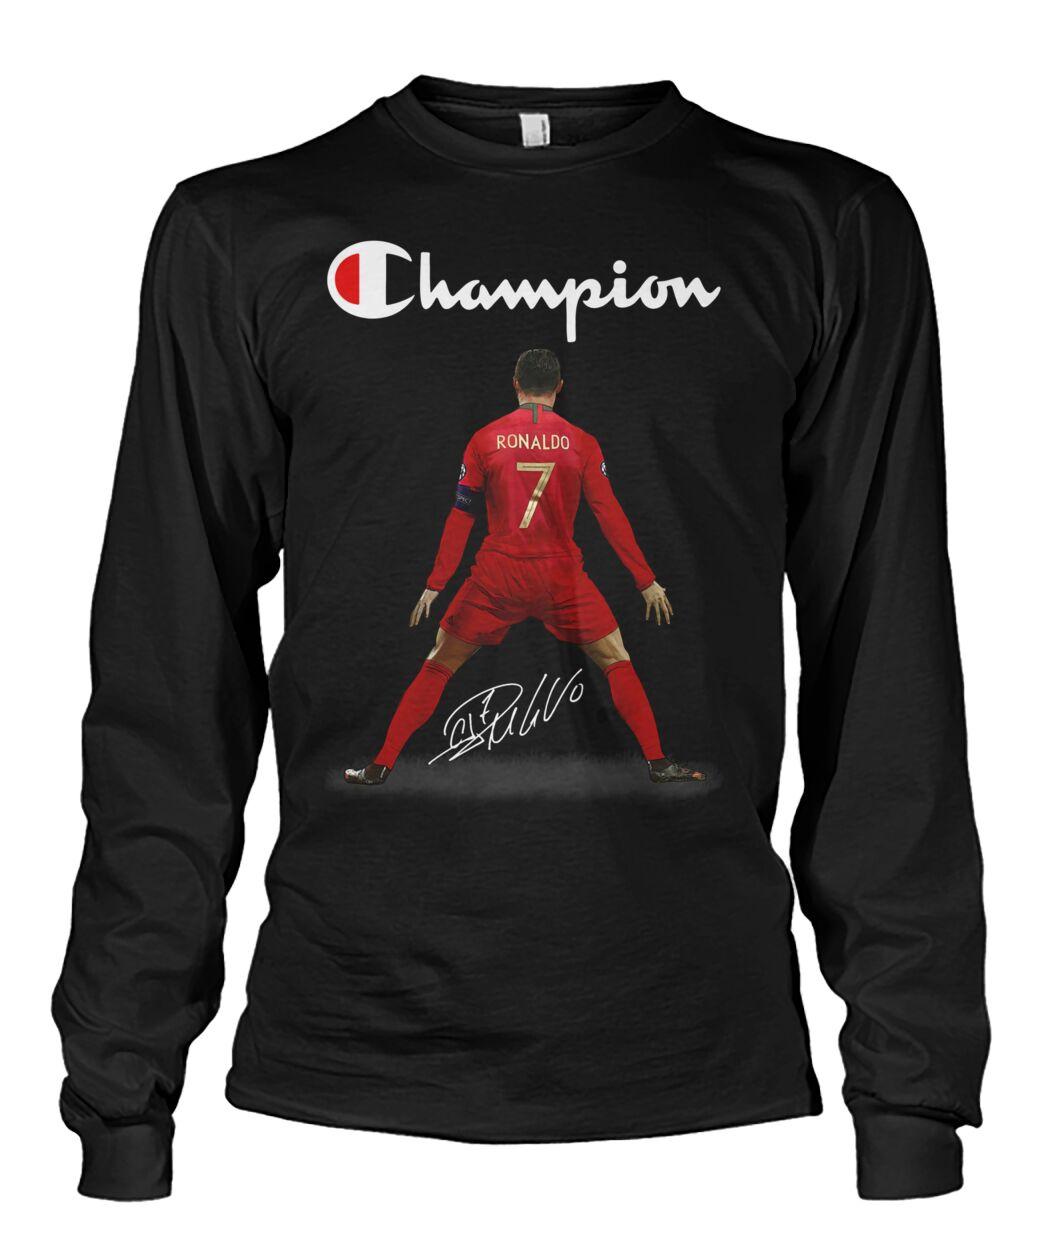 Ronaldo champions league shirt 13